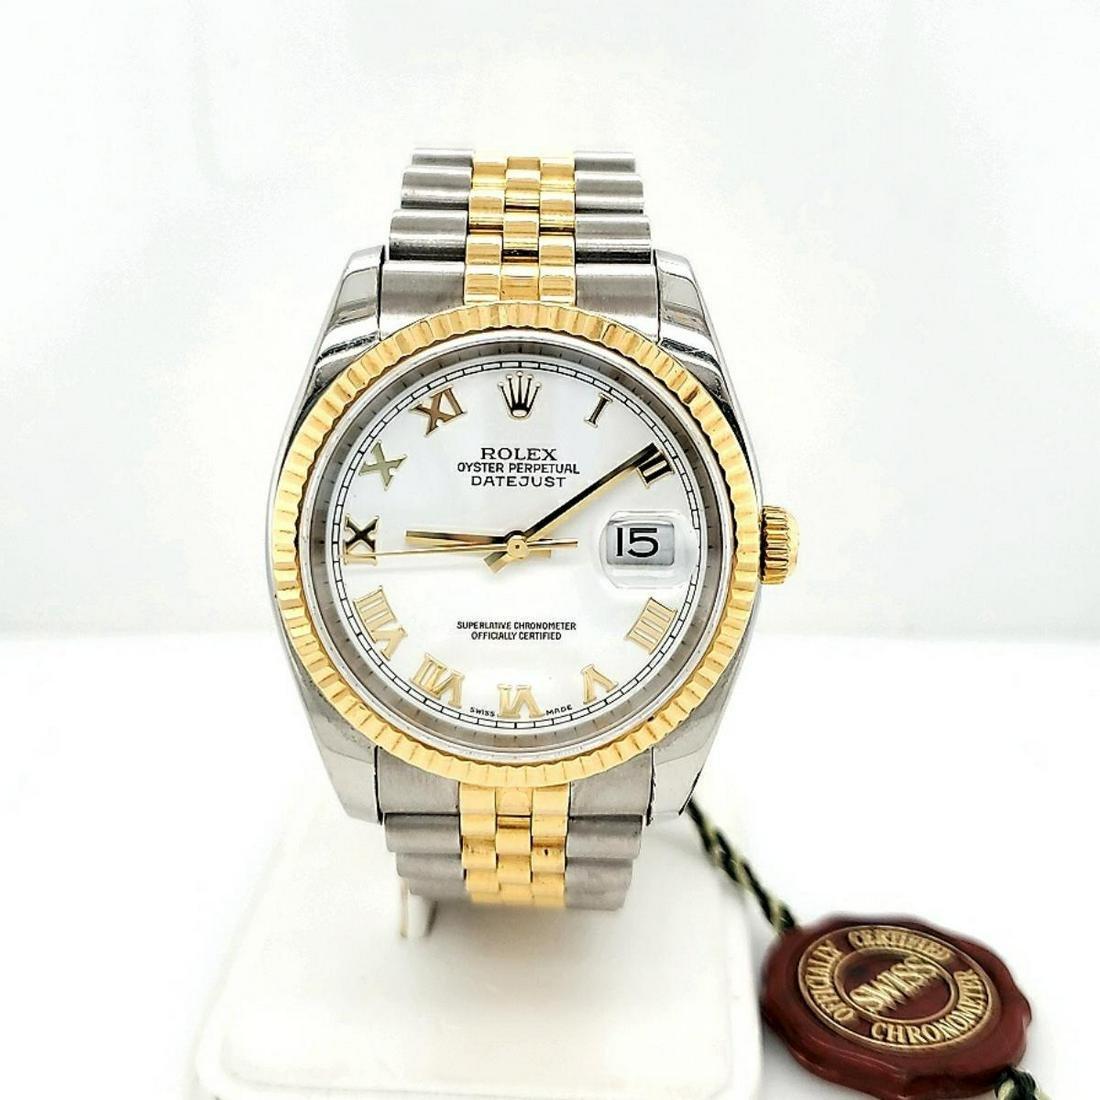 Men's two tone Rolex Datejust watch